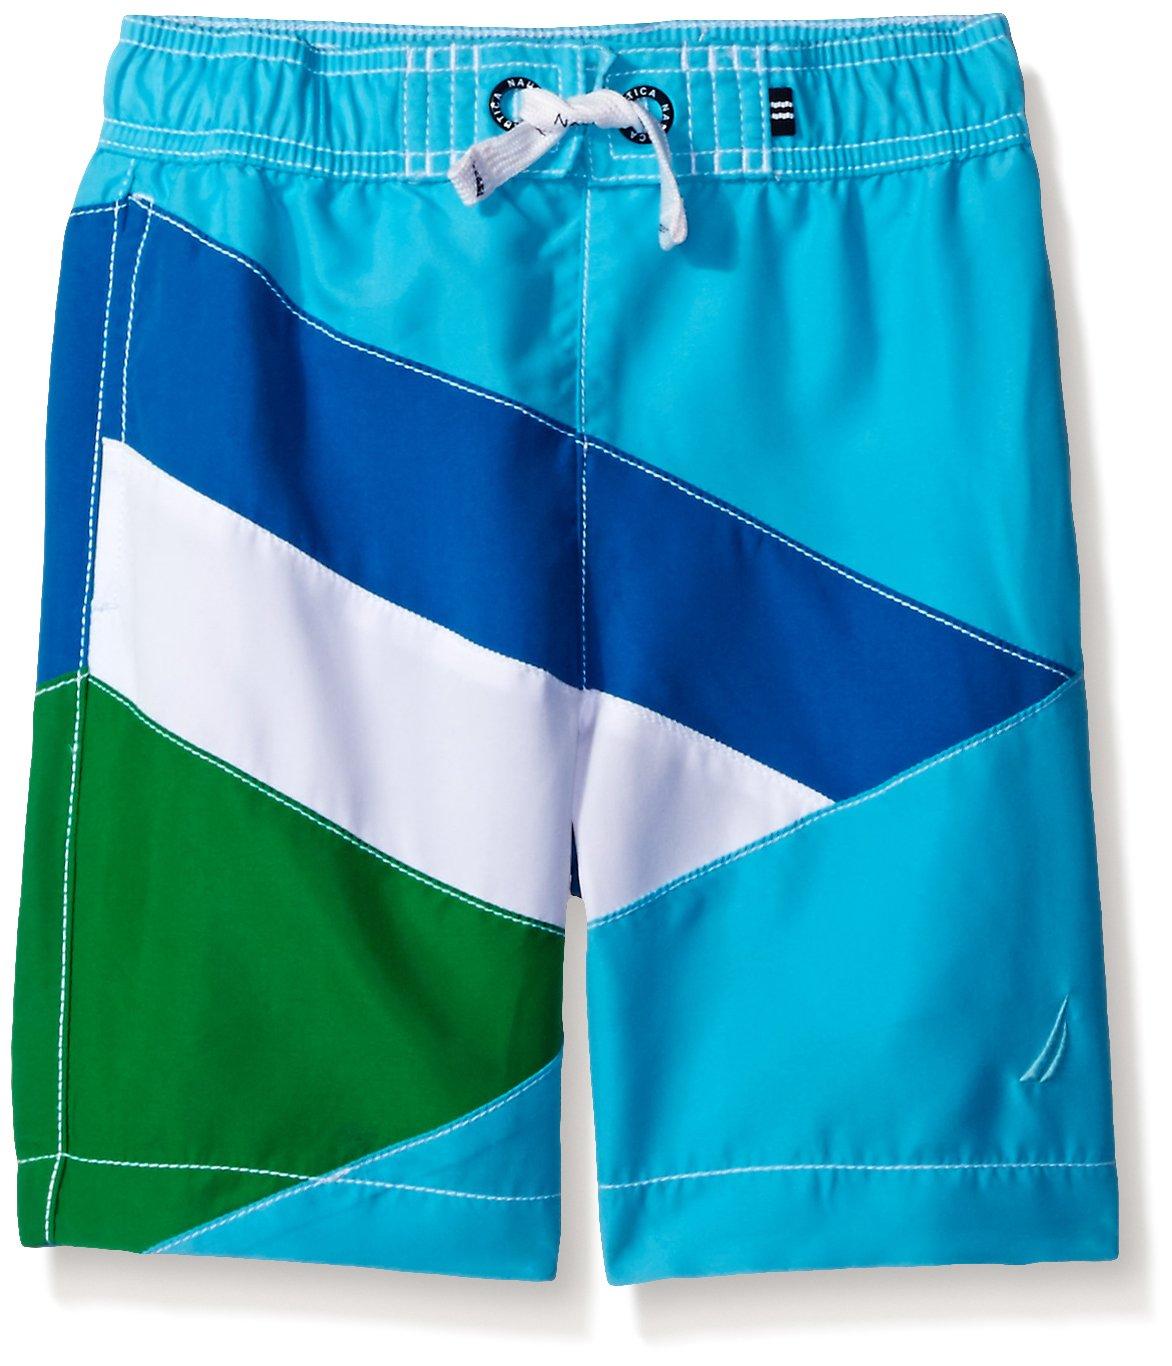 9810df0e9f Galleon - Nautica Little Boys' Swim Trunk With UPF 50+ Sun Protection,  Turquoise Colorblock, Large (7)